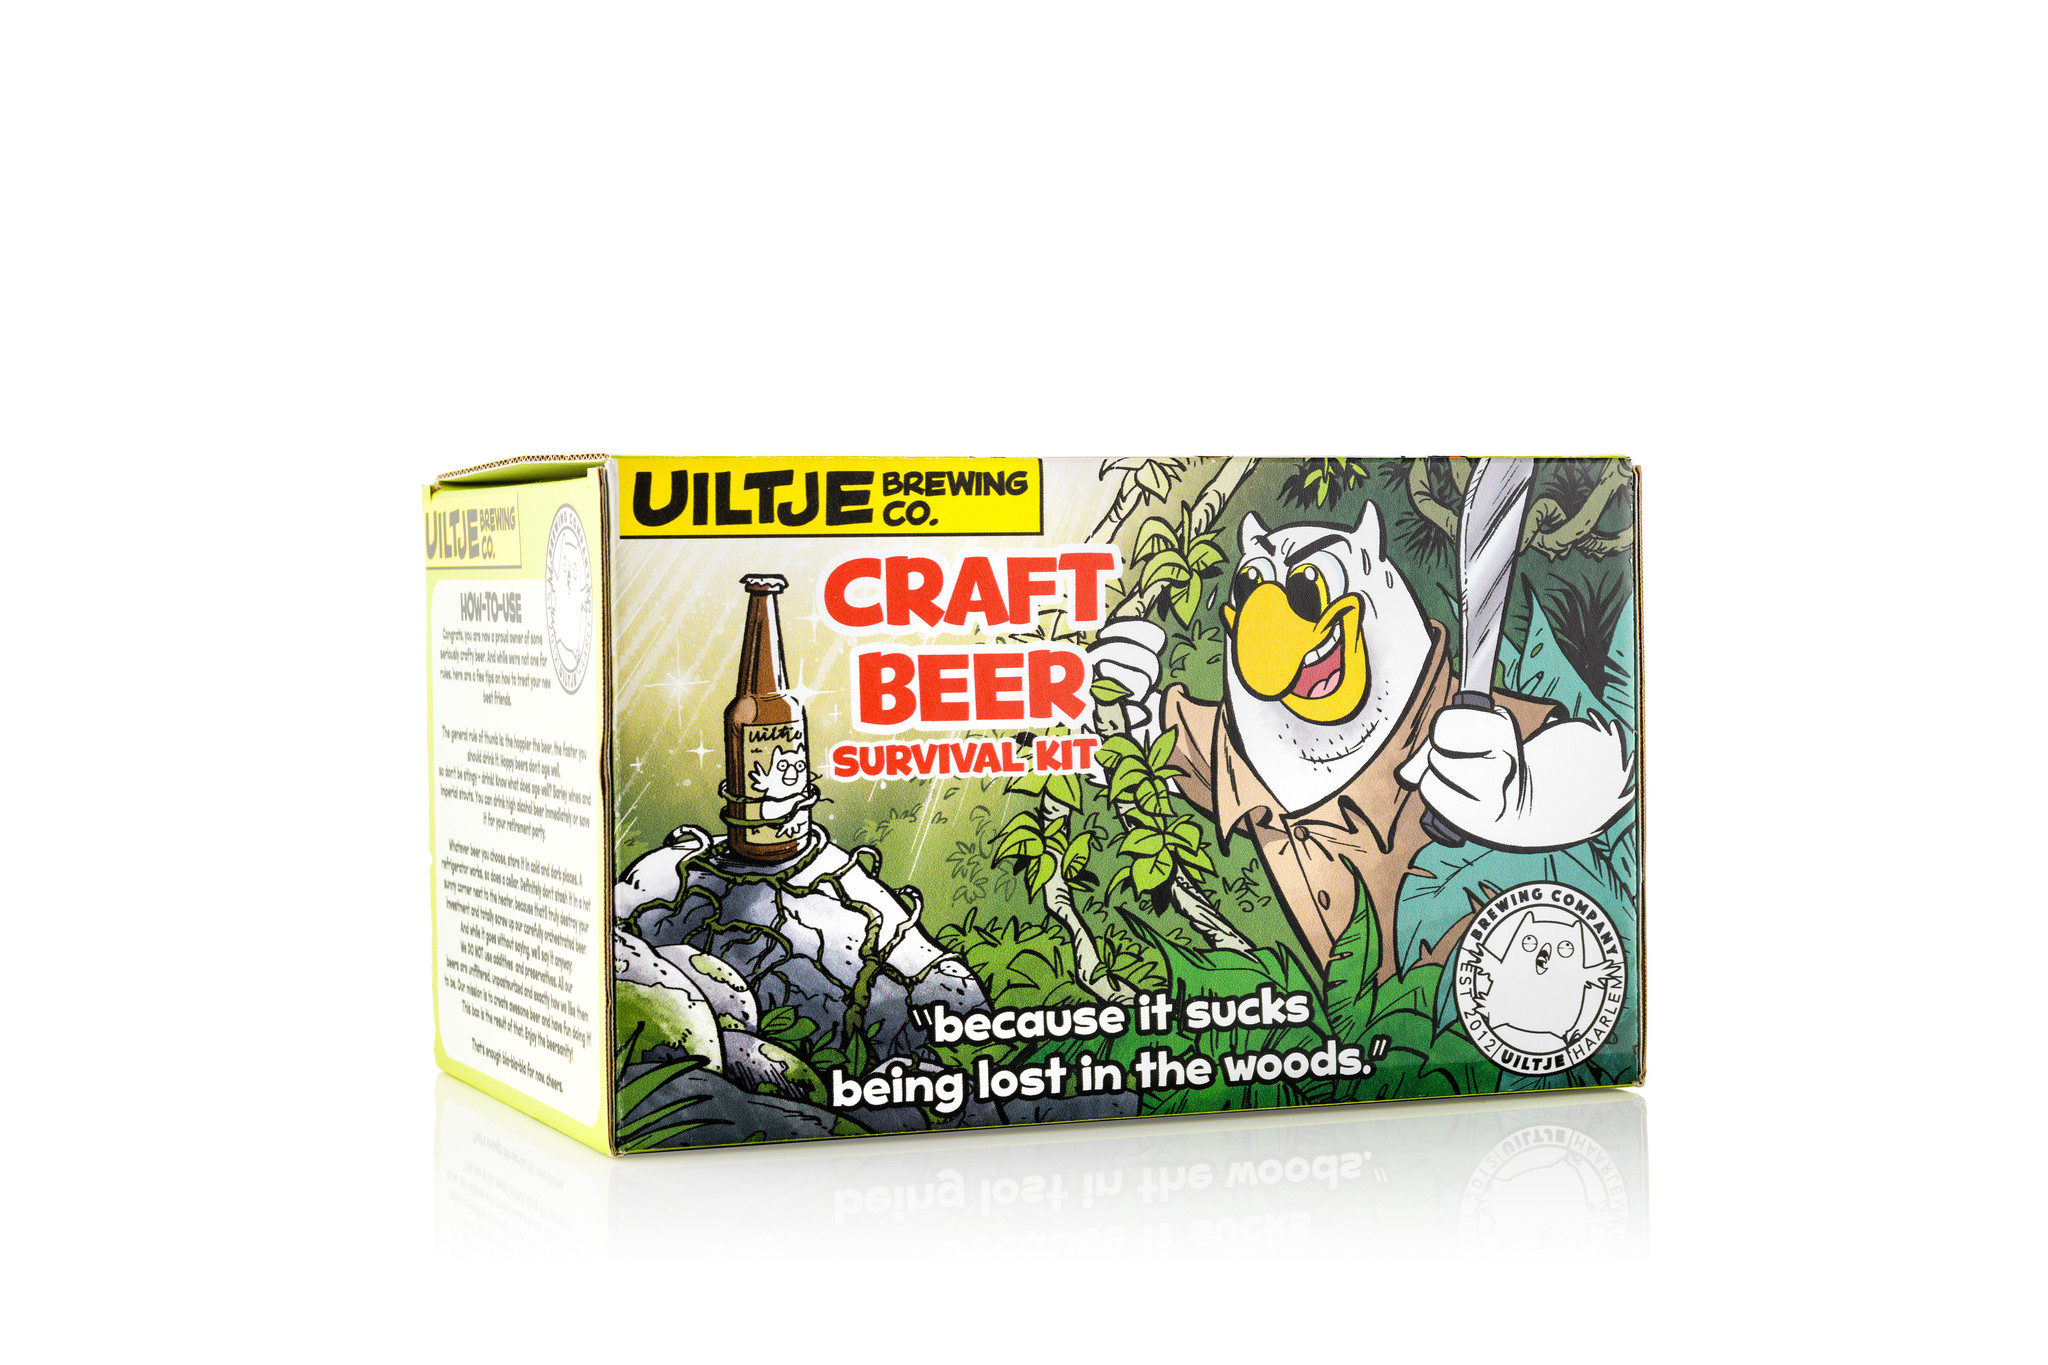 Uiltje- Craft Beer Survival Kit- Sixpack